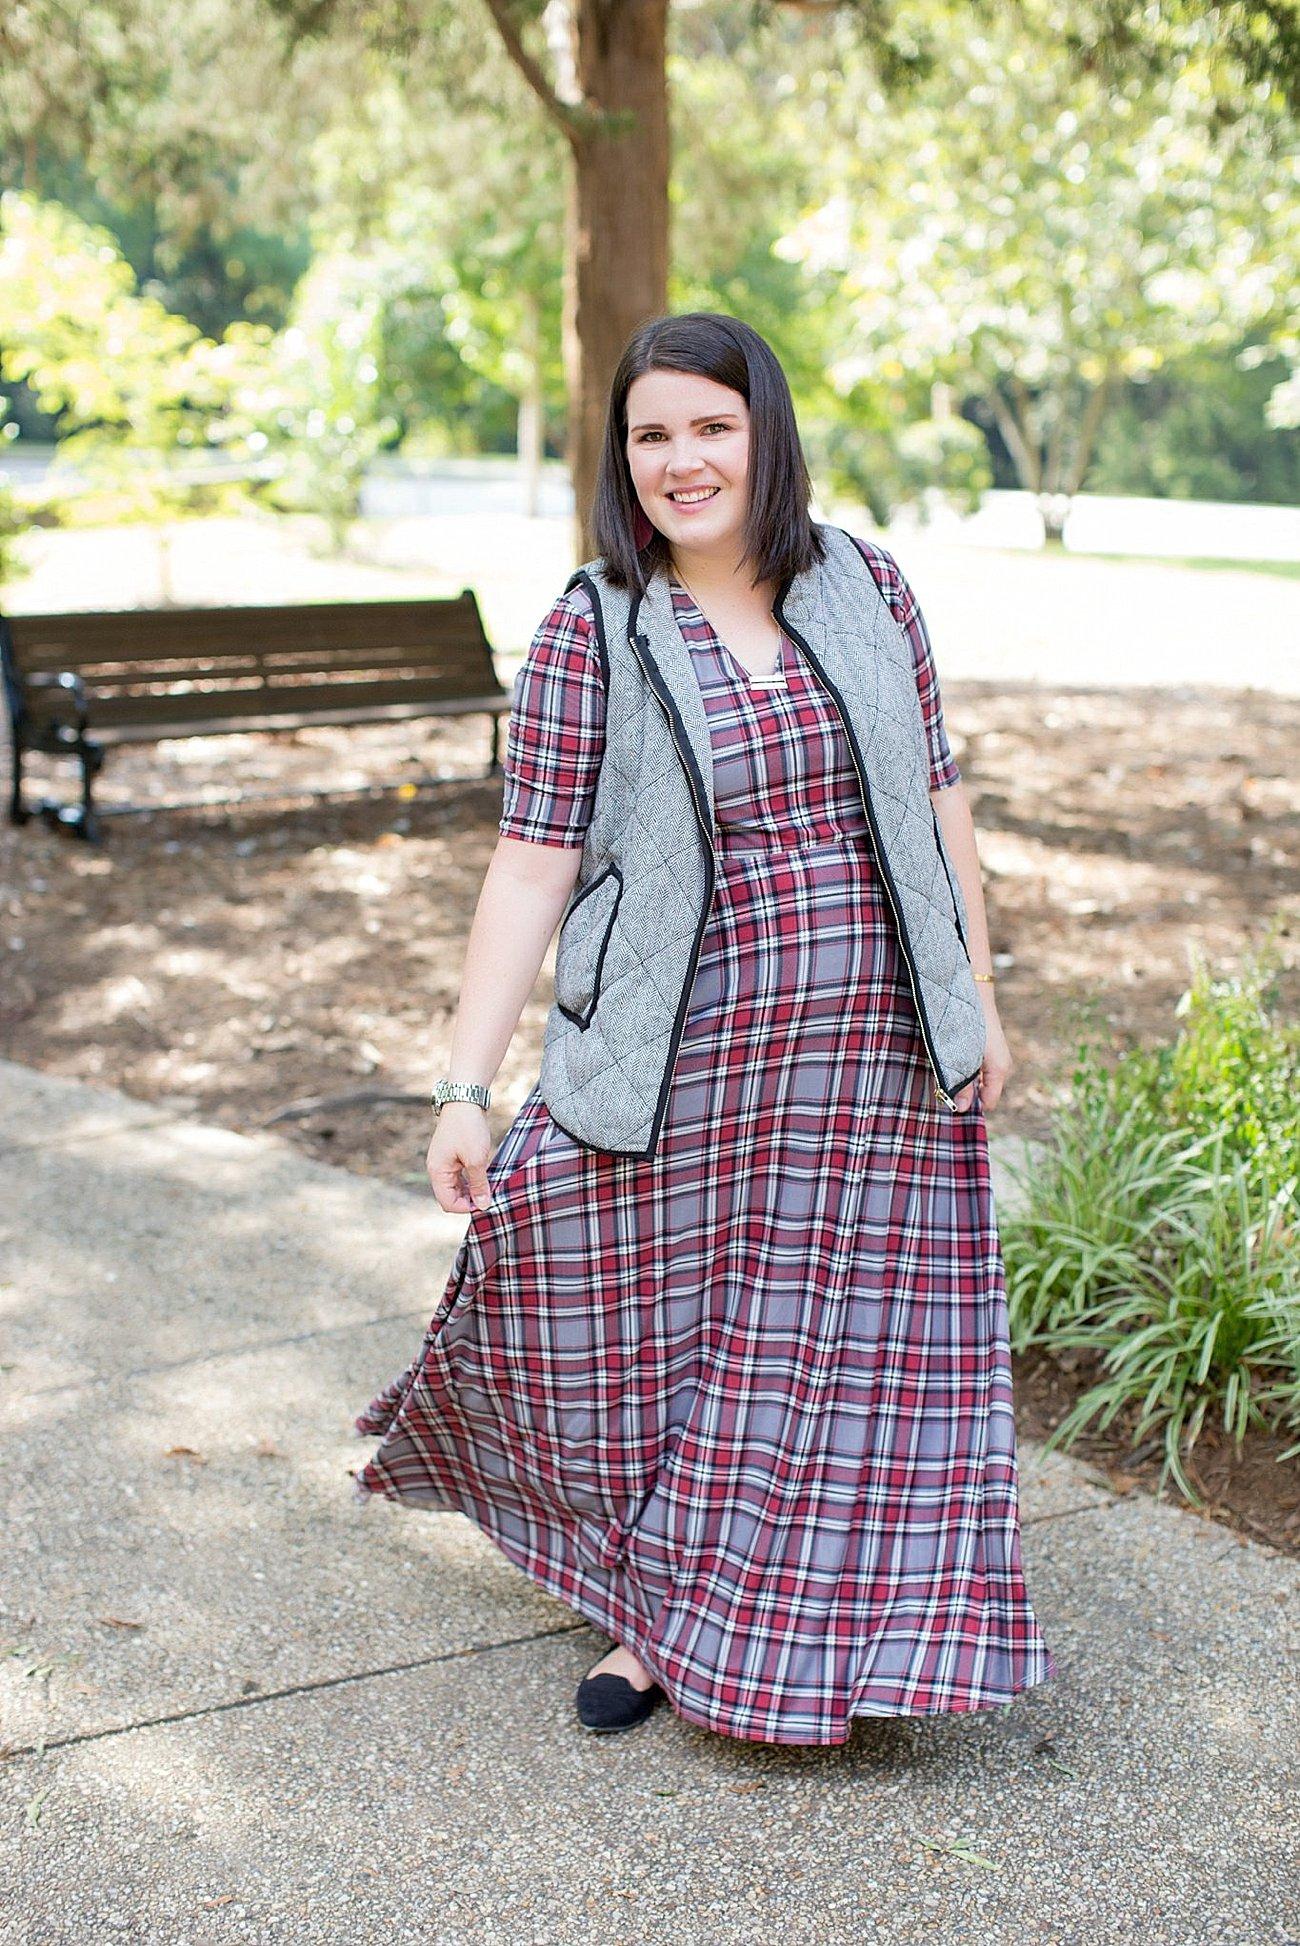 Agnes & Dora plaid Austen dress, herringbone vest, fall fashion, ethical fall fashion | North Carolina life and style blogger (2)